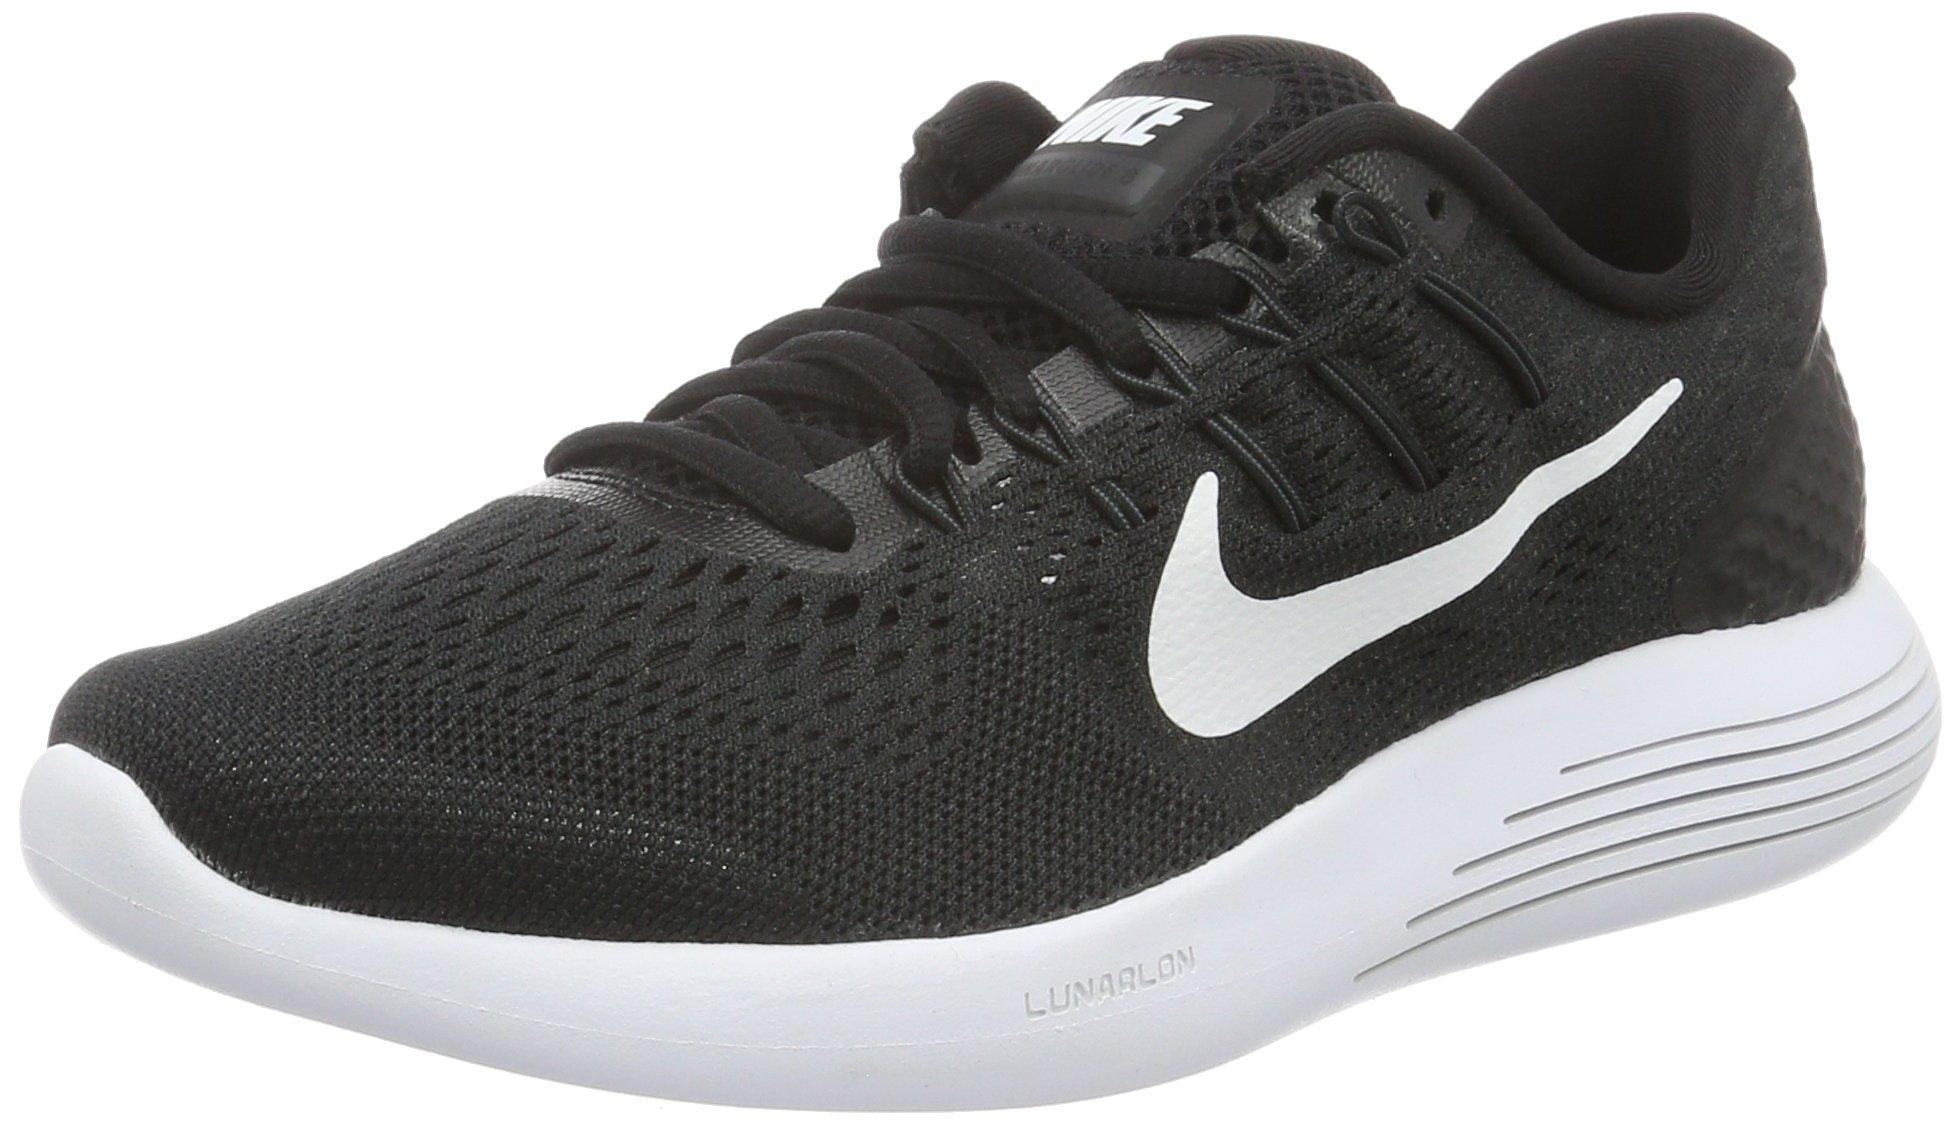 wholesale dealer d22a9 28147 Galleon - Nike Men s Lunarglide 8 Running Shoe Black White Anthracite Size  11.5 M US